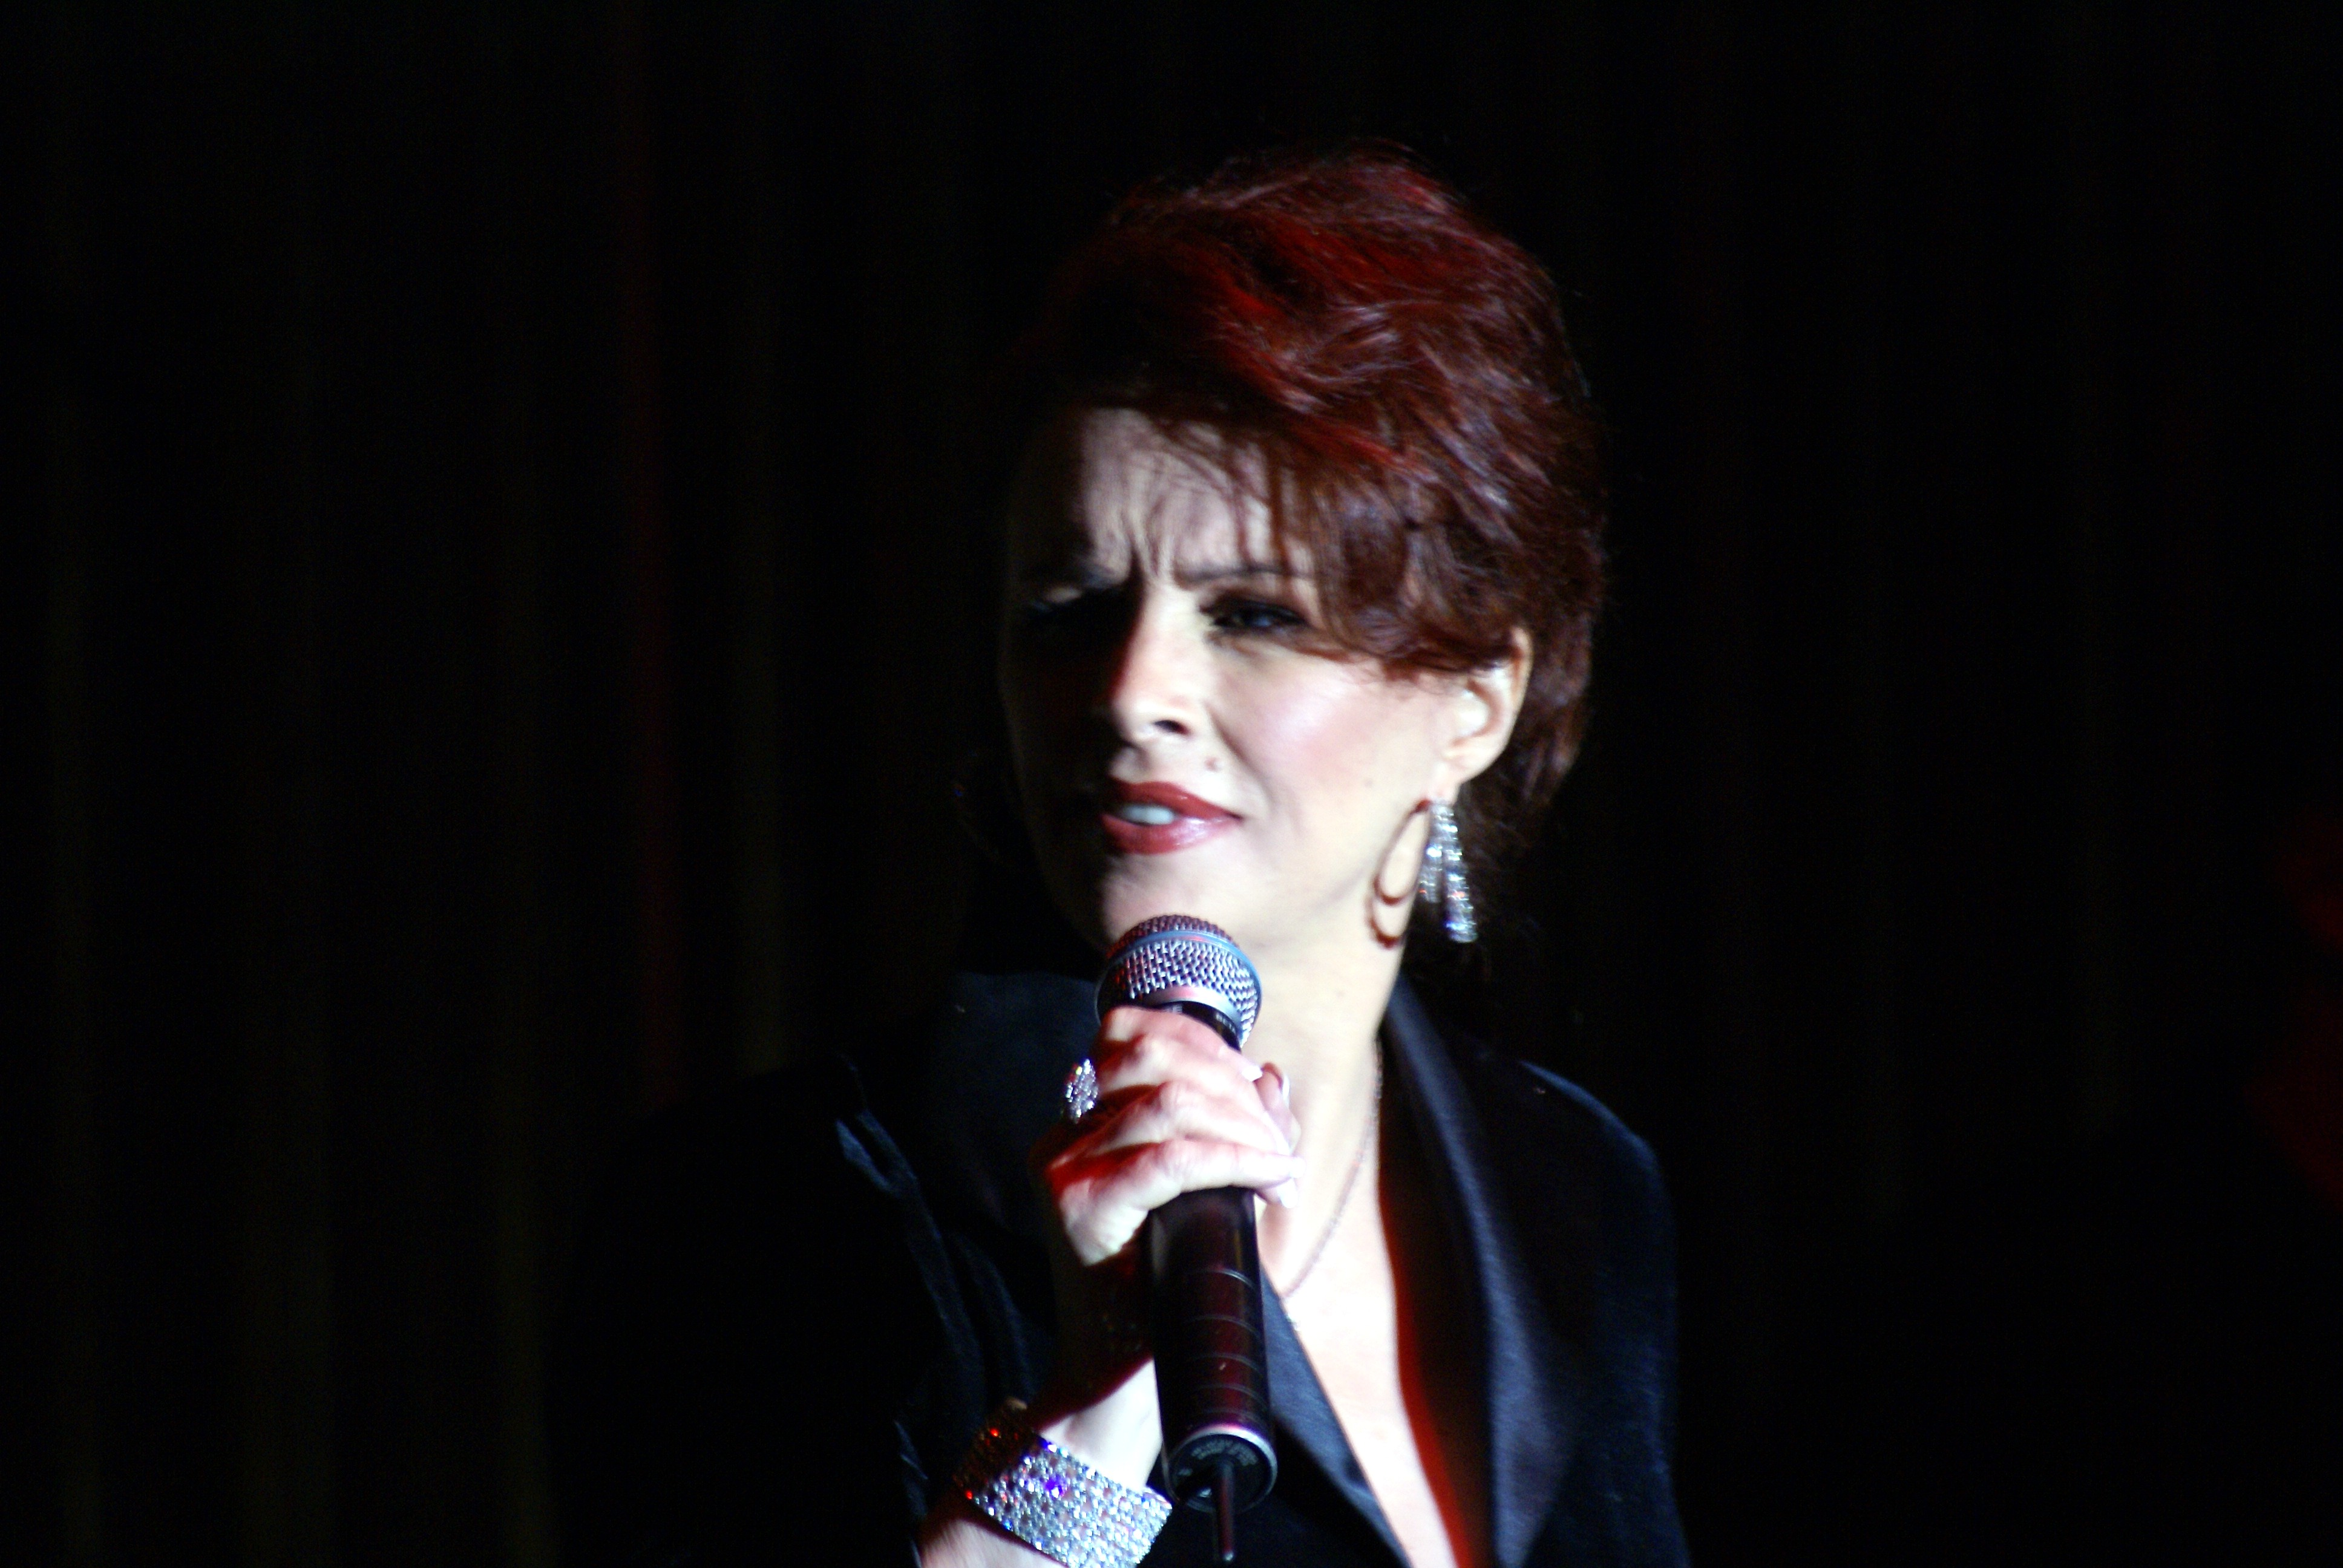 Sheena Easton (born 1959 (naturalized American citizen)